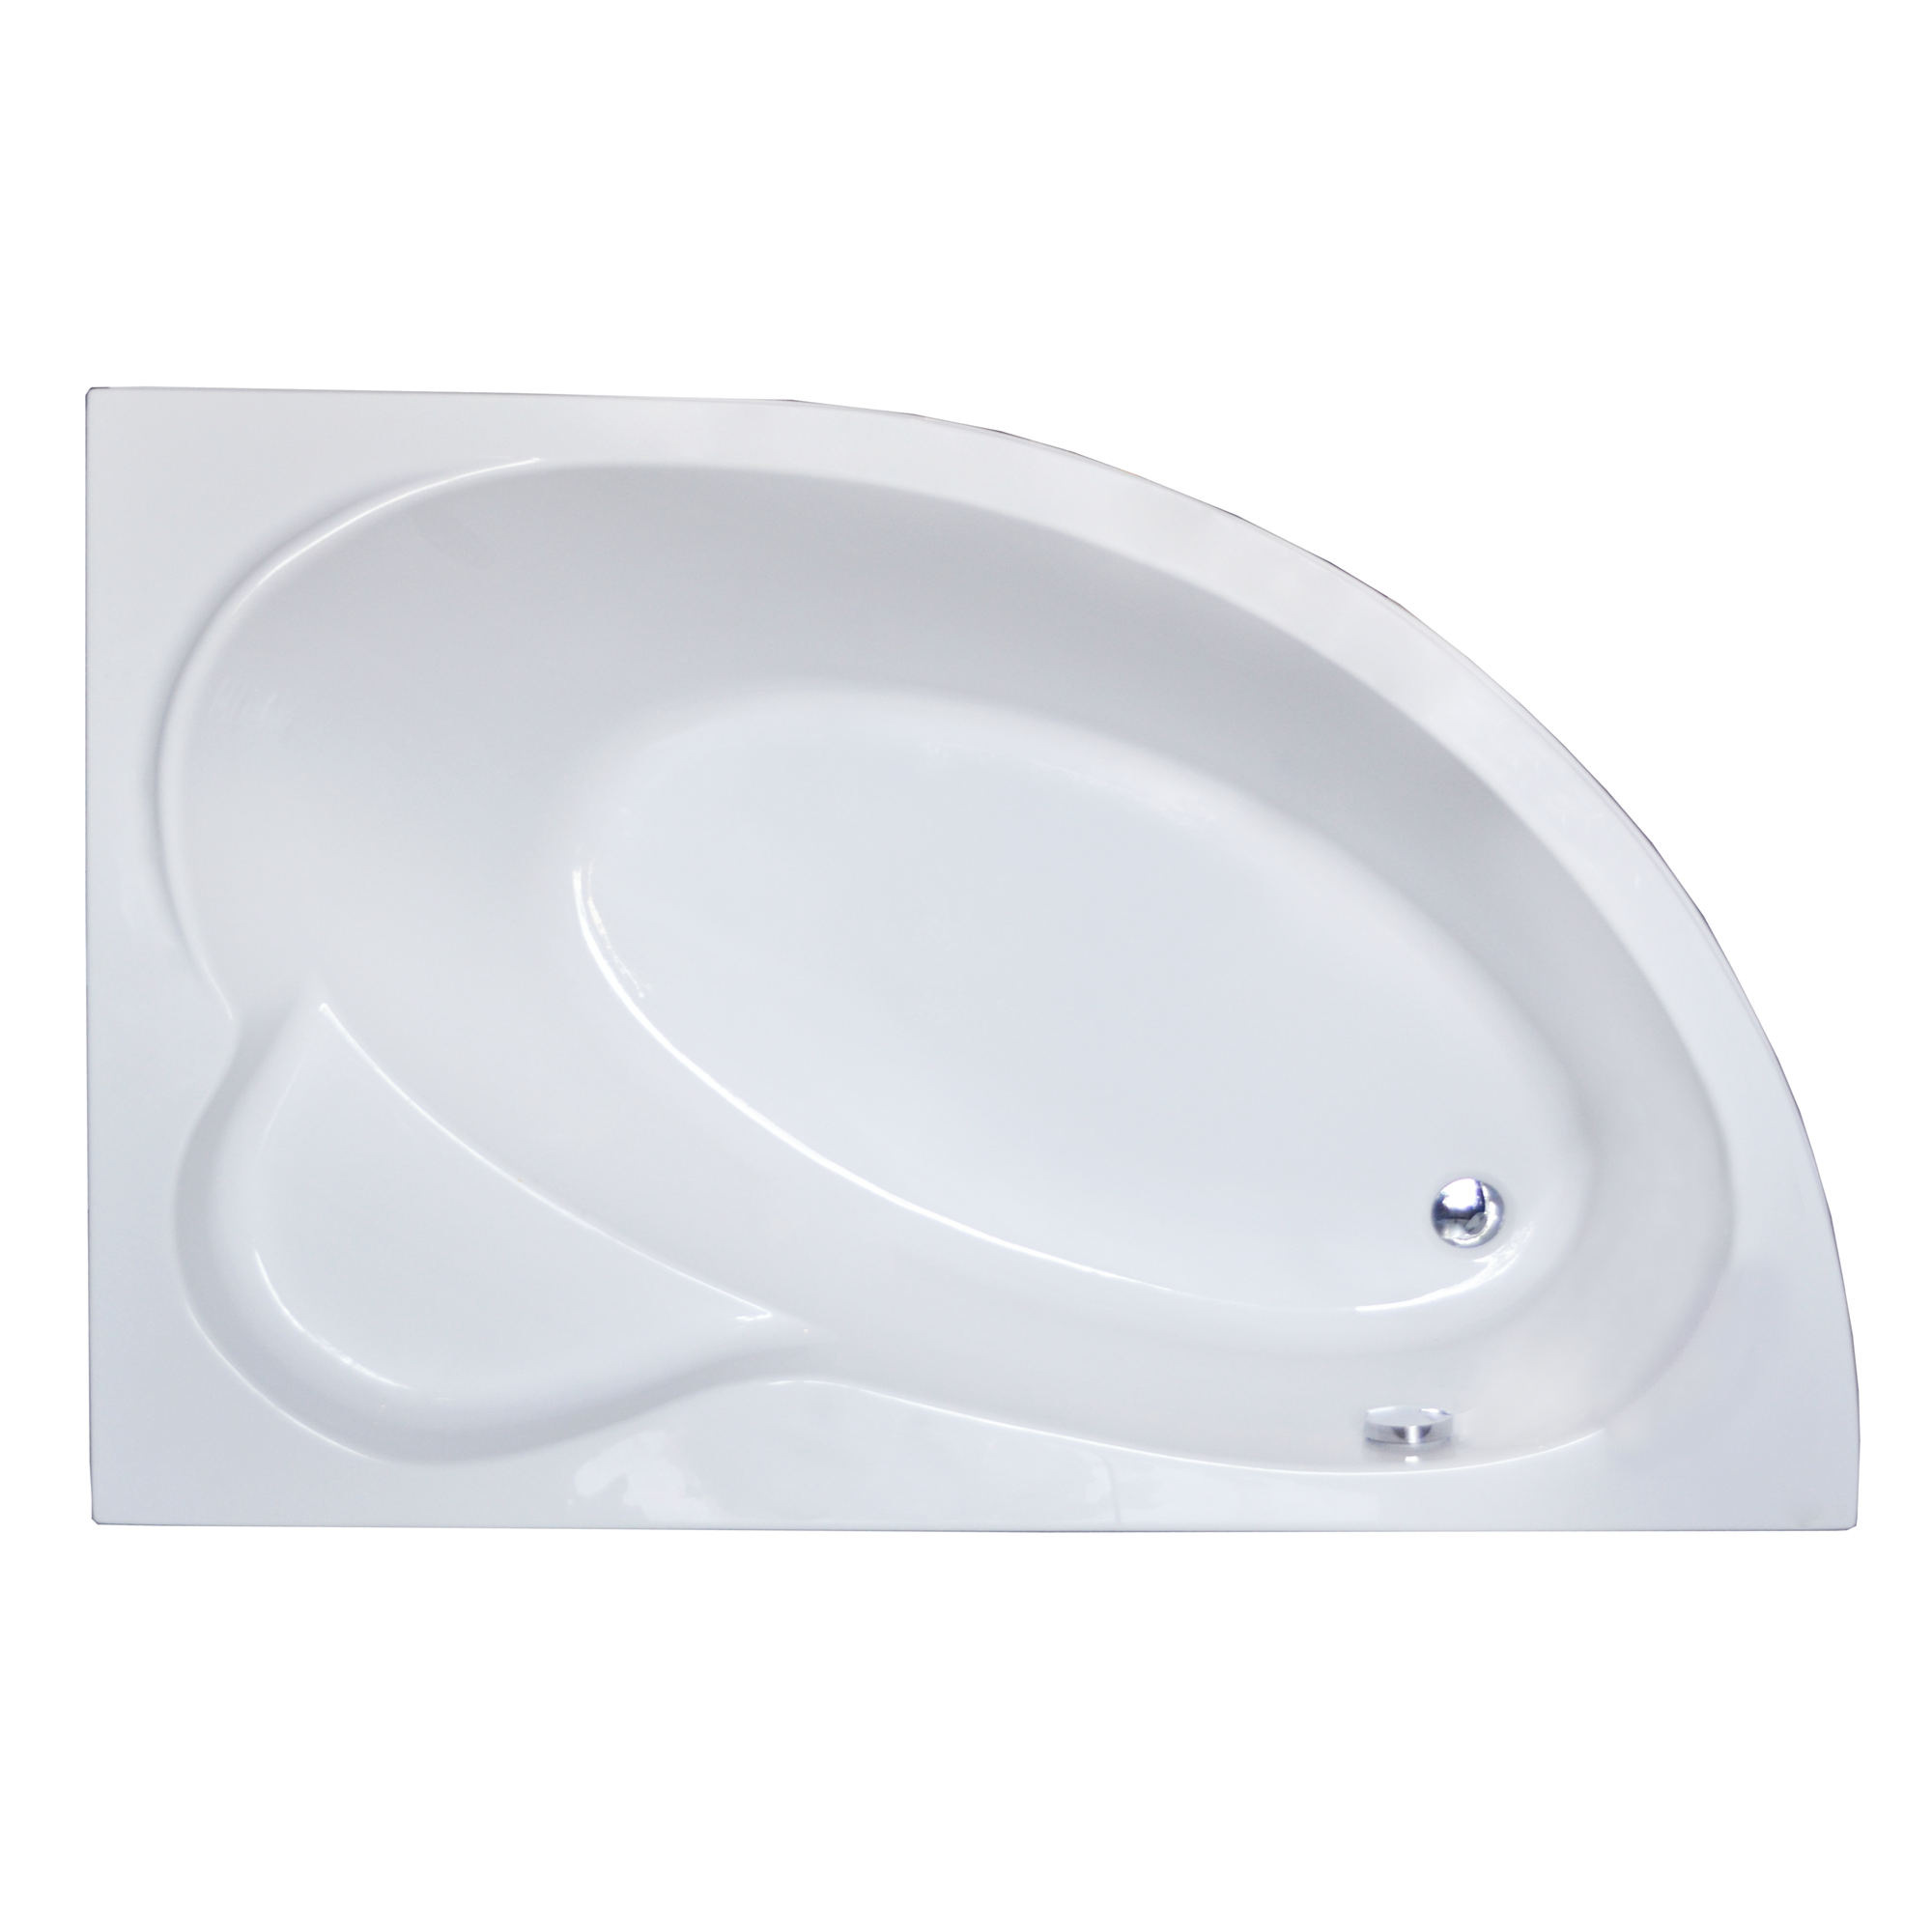 Акриловая ванна Royal bath Alpine RB819102 170х100 R акриловая ванна royal bath alpine rb 819101 правая 160х100 rb819101r